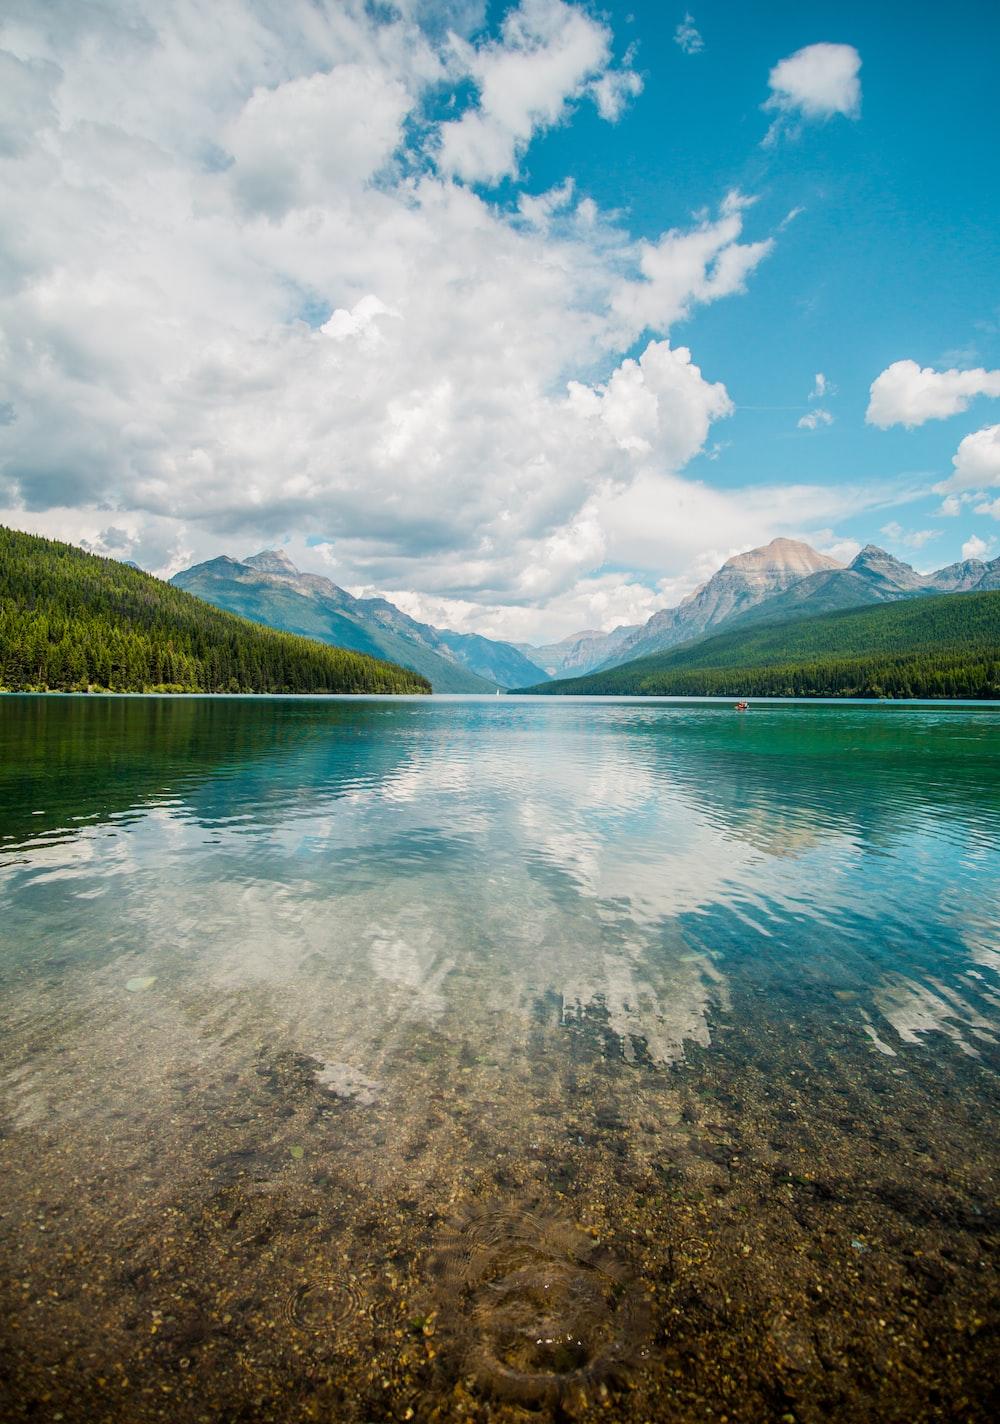 lake near green mountain